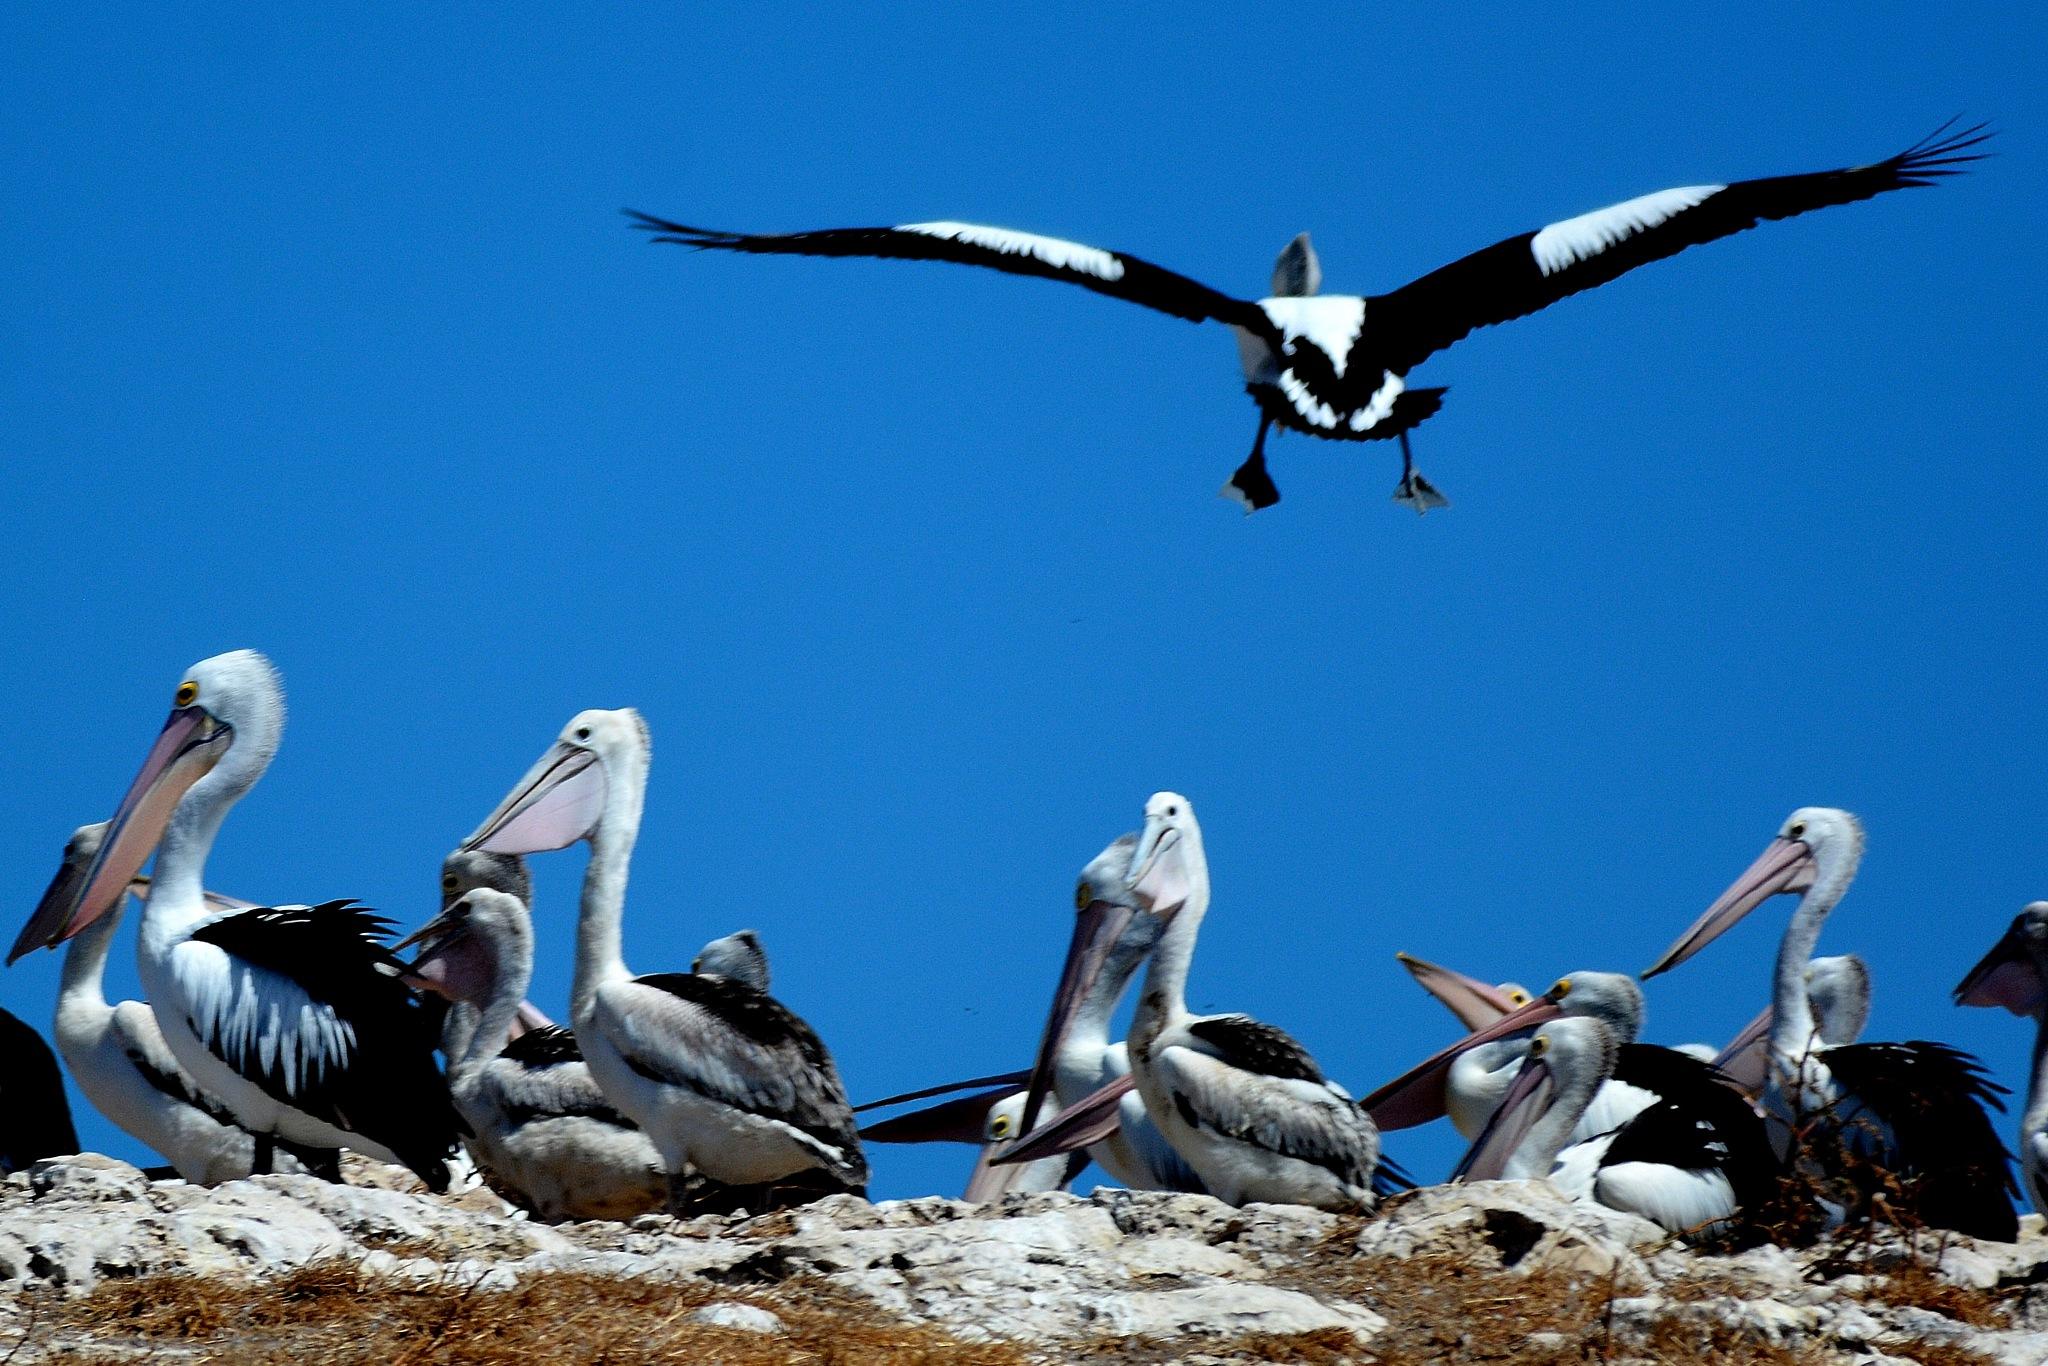 Pelican Island by aaron.patterson.9889